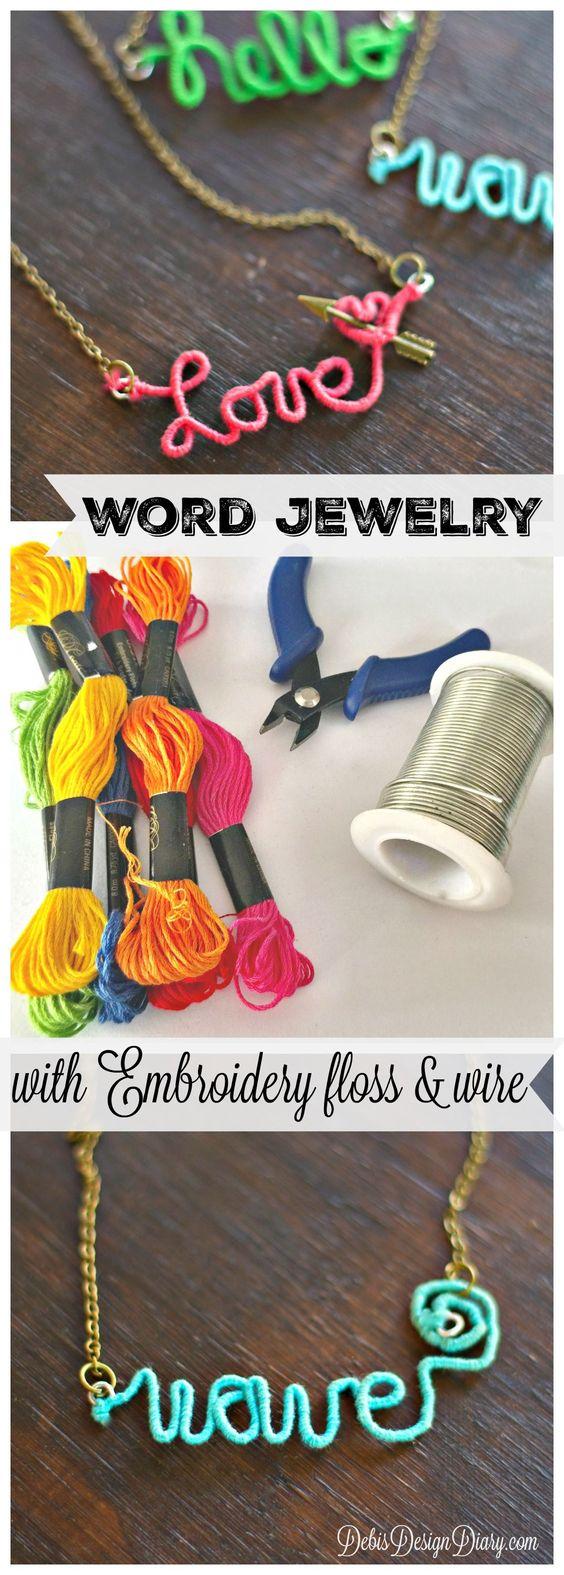 Personalized Wire Word Jewelry Anthropologie knock off Jewelry